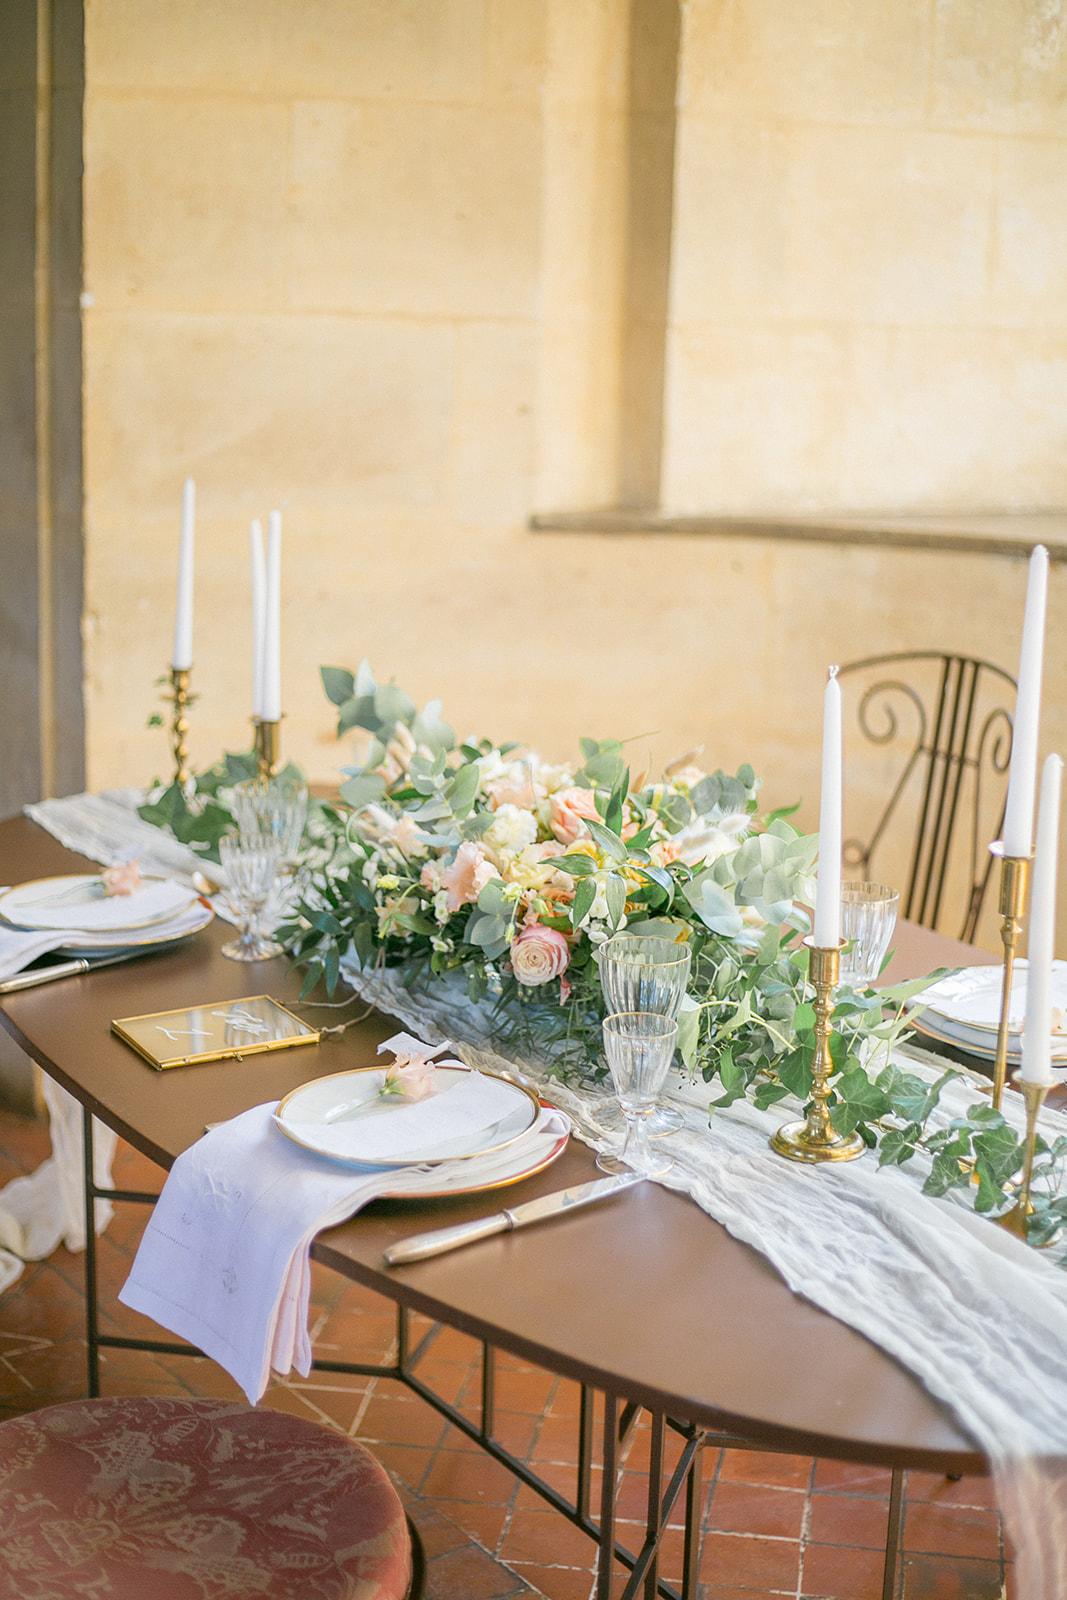 pretty floral centerpiece for french rustic wedding tablescape design idea